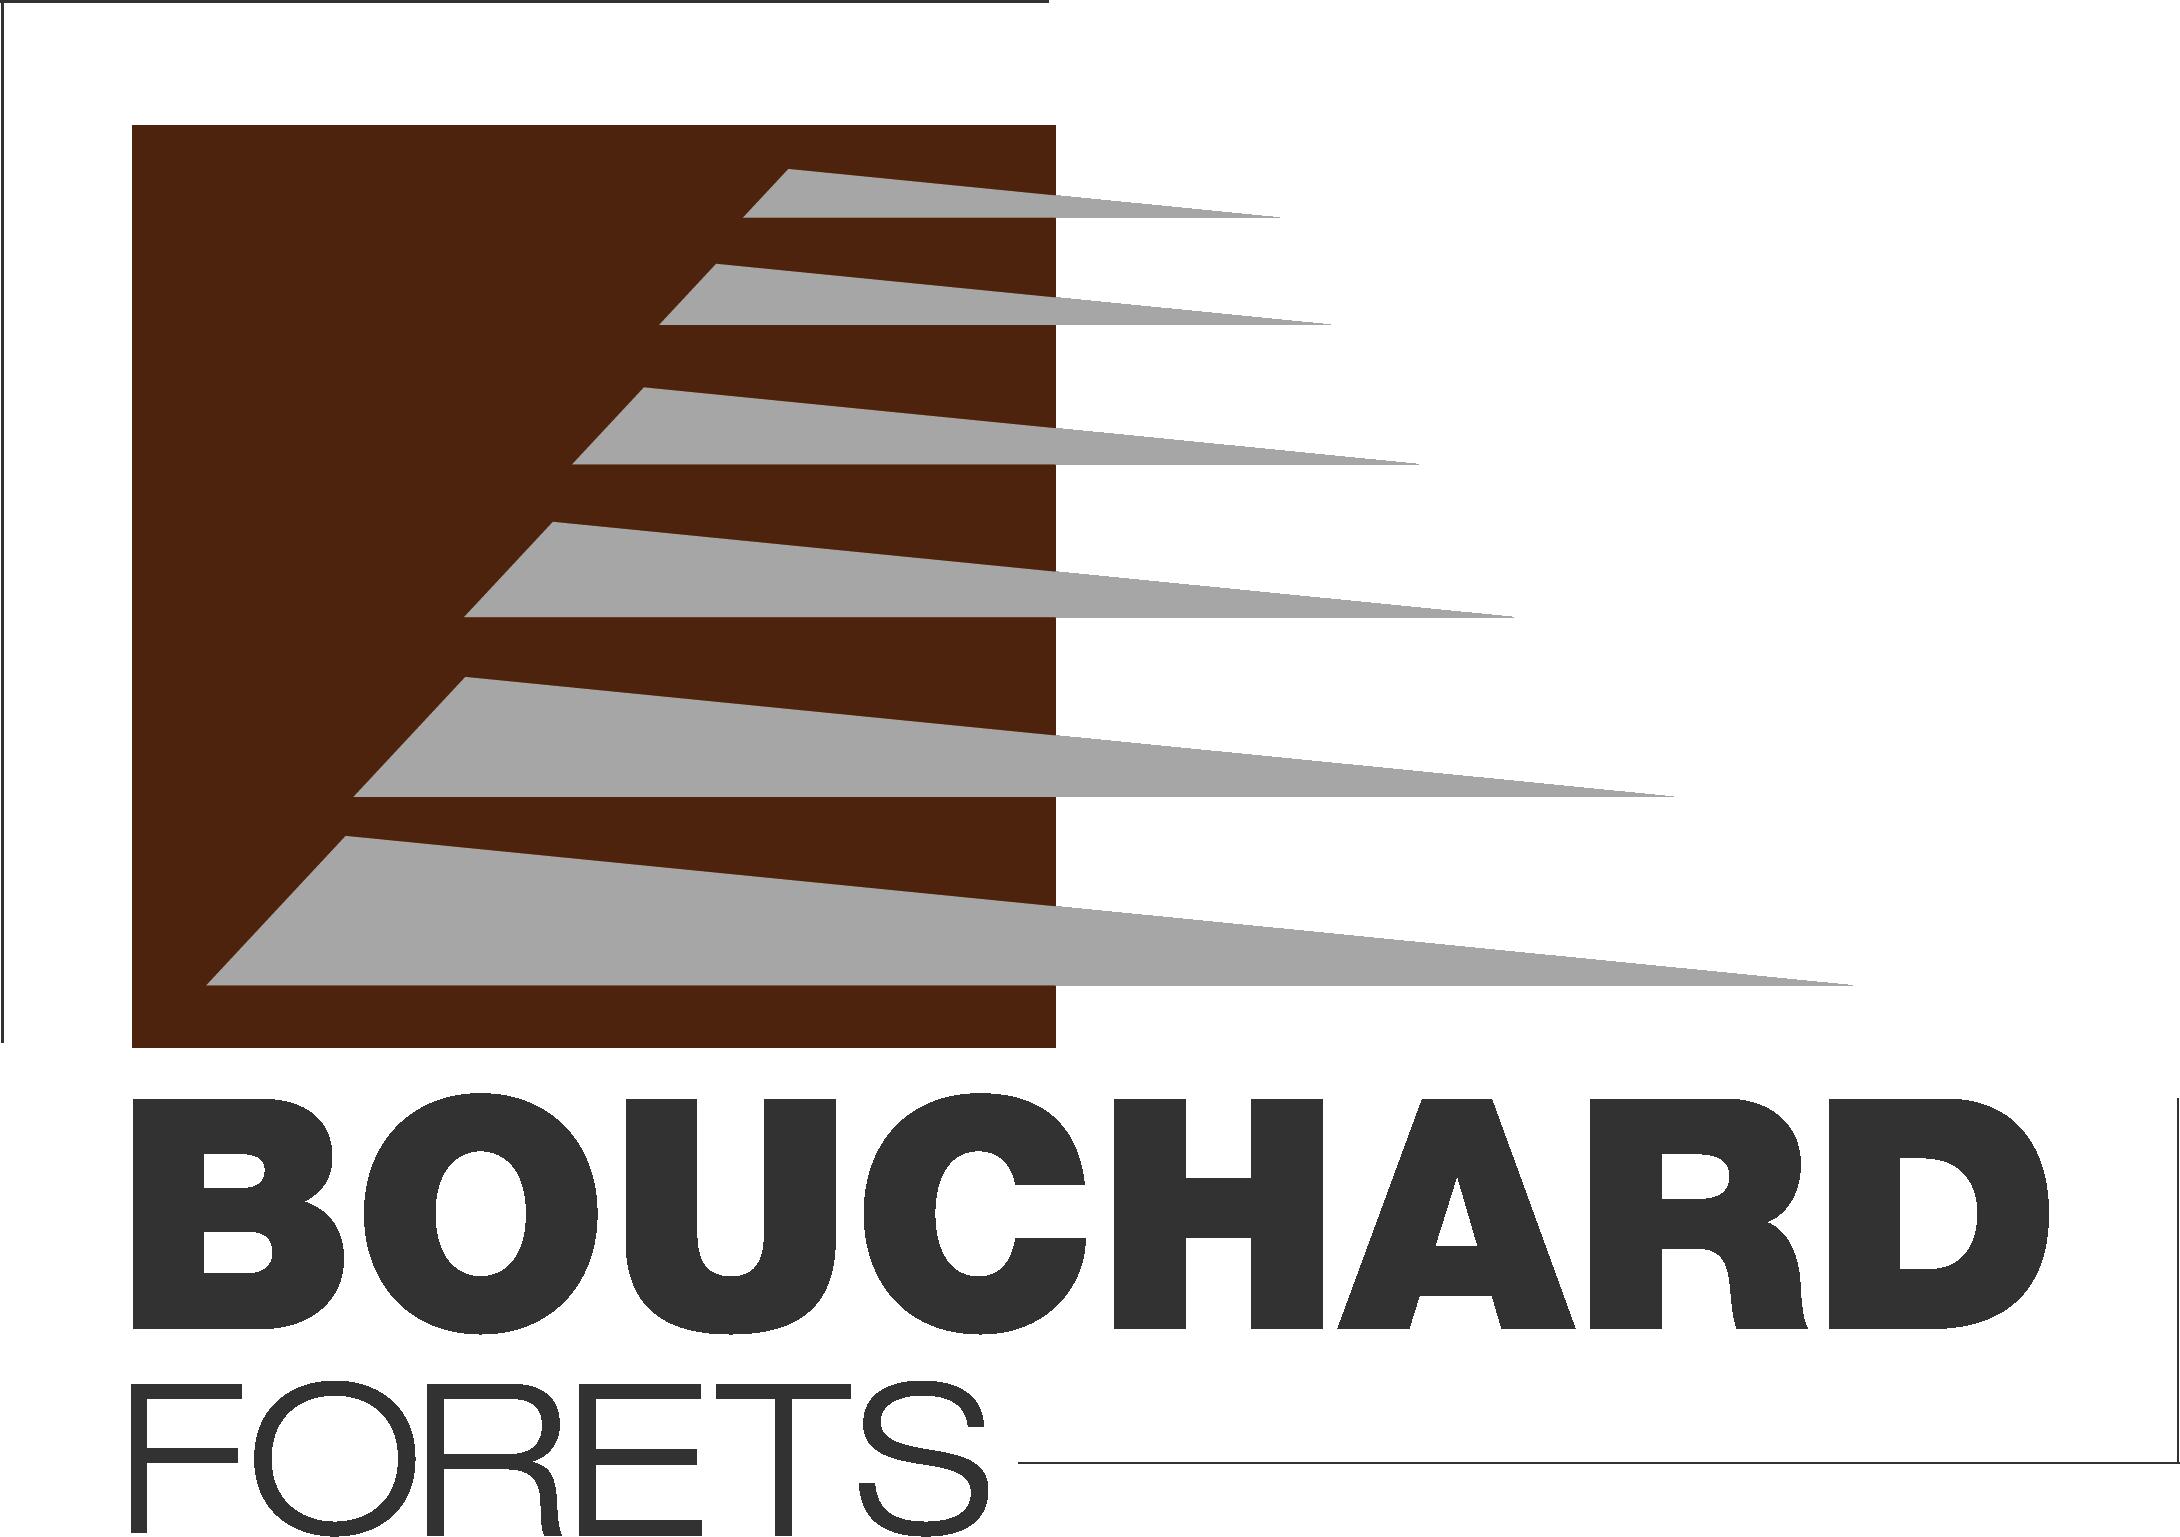 Bouchard Forêts